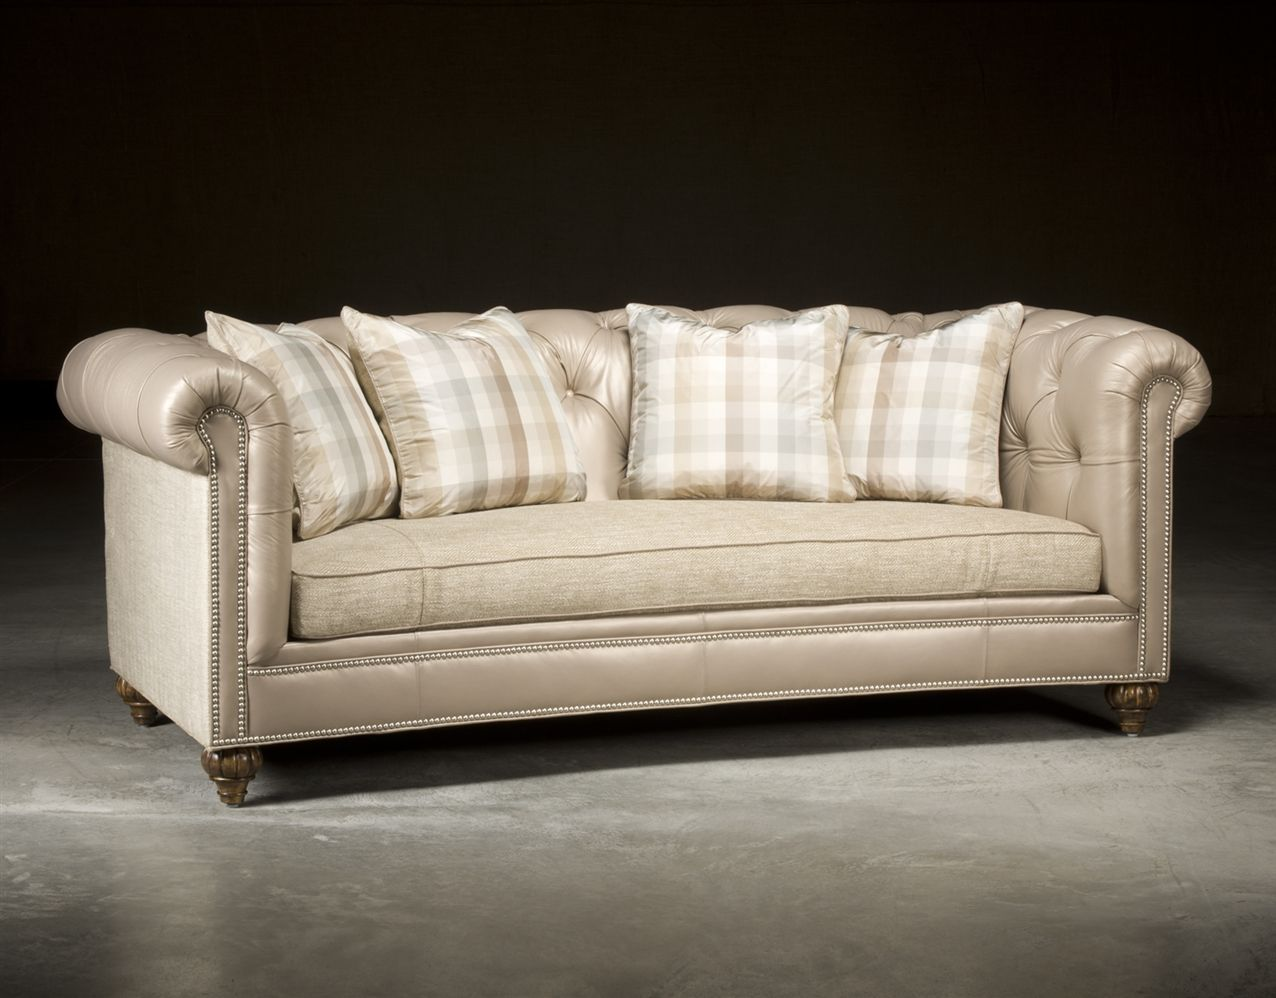 chesterfield sectional sofa suppliers next sonoma corner review high end designer sofas 72 qty description